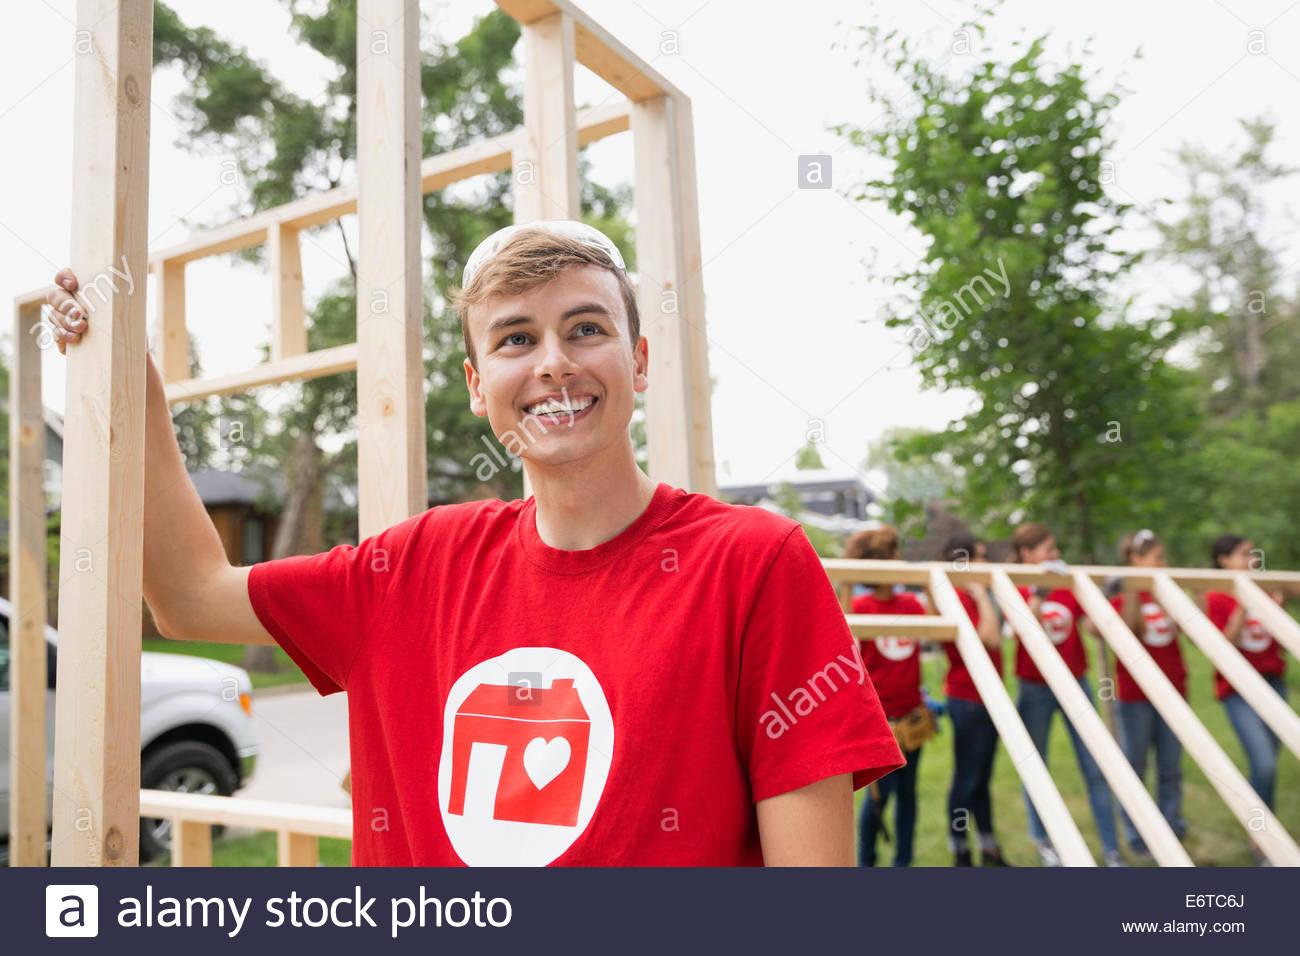 Smiling volunteer at construction frame - Stock Image